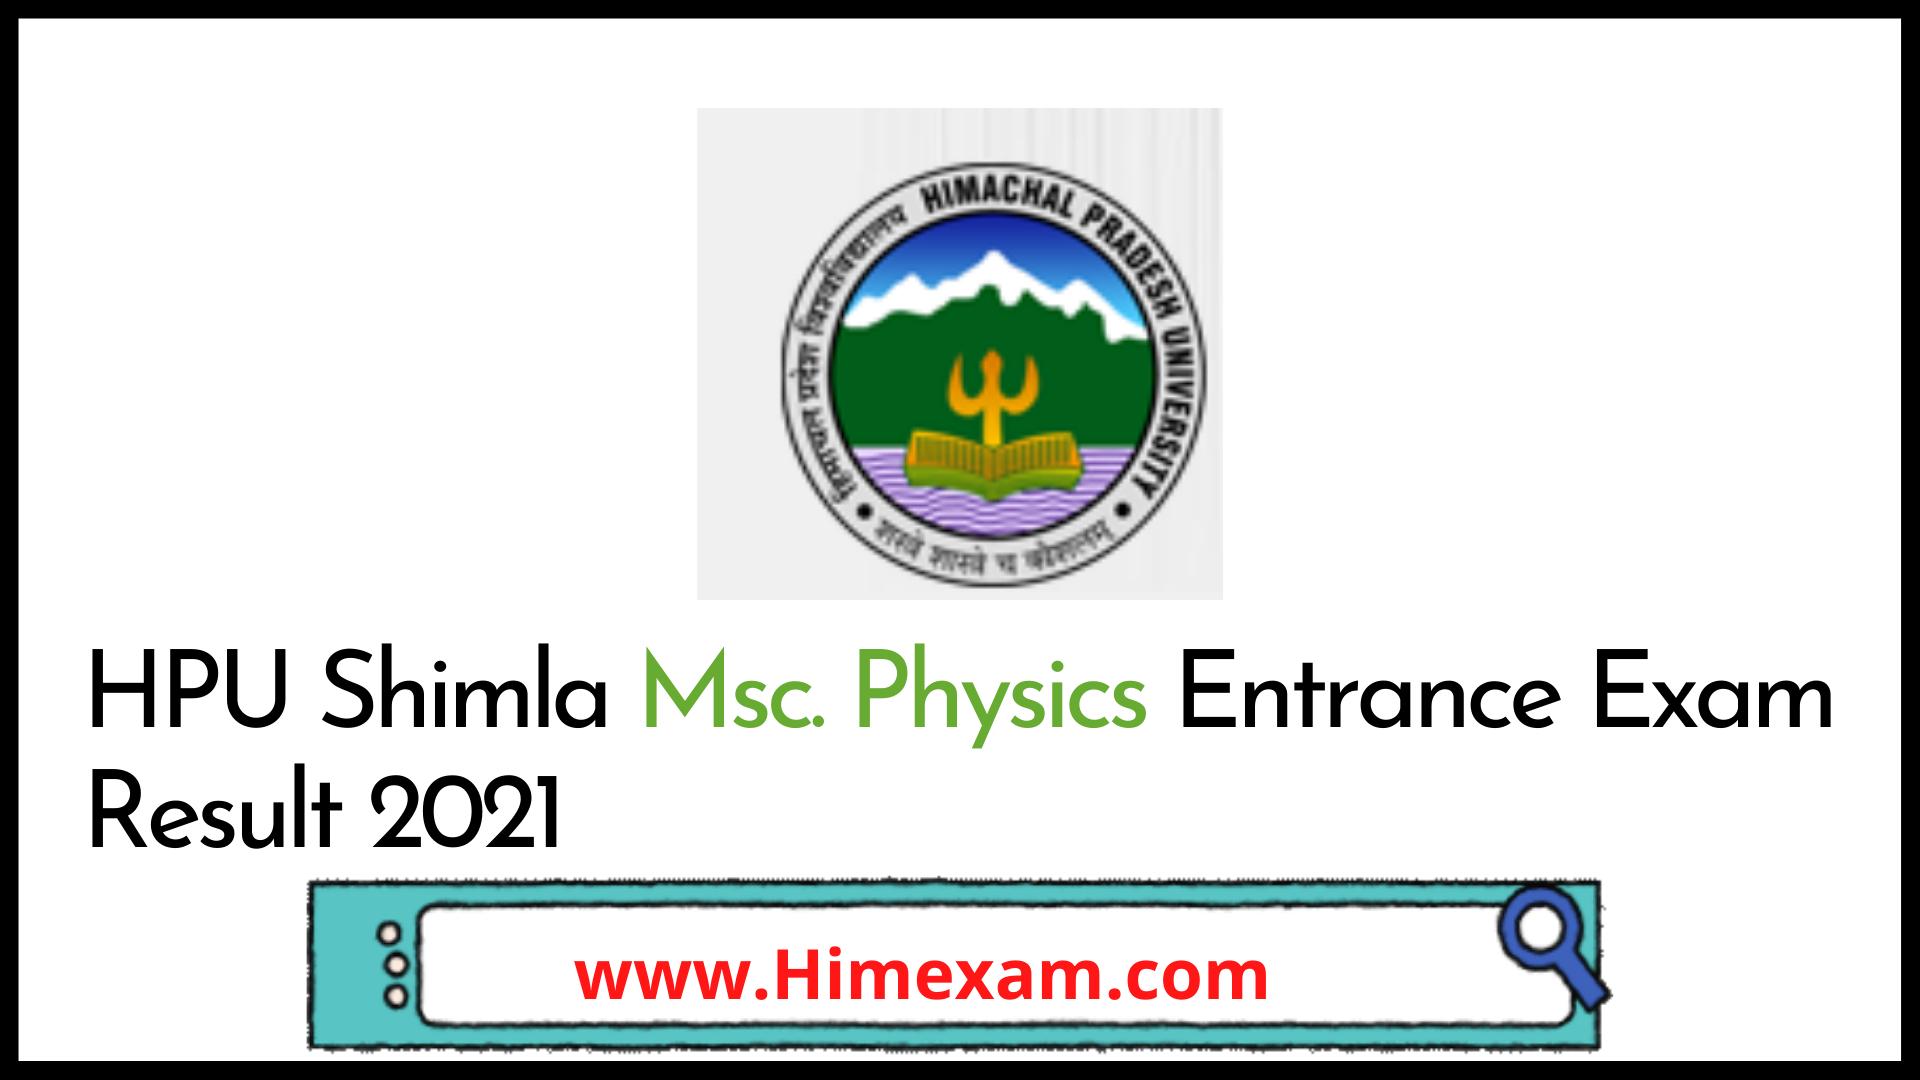 HPU Shimla M.sc. Physics Entrance Exam Result 2021